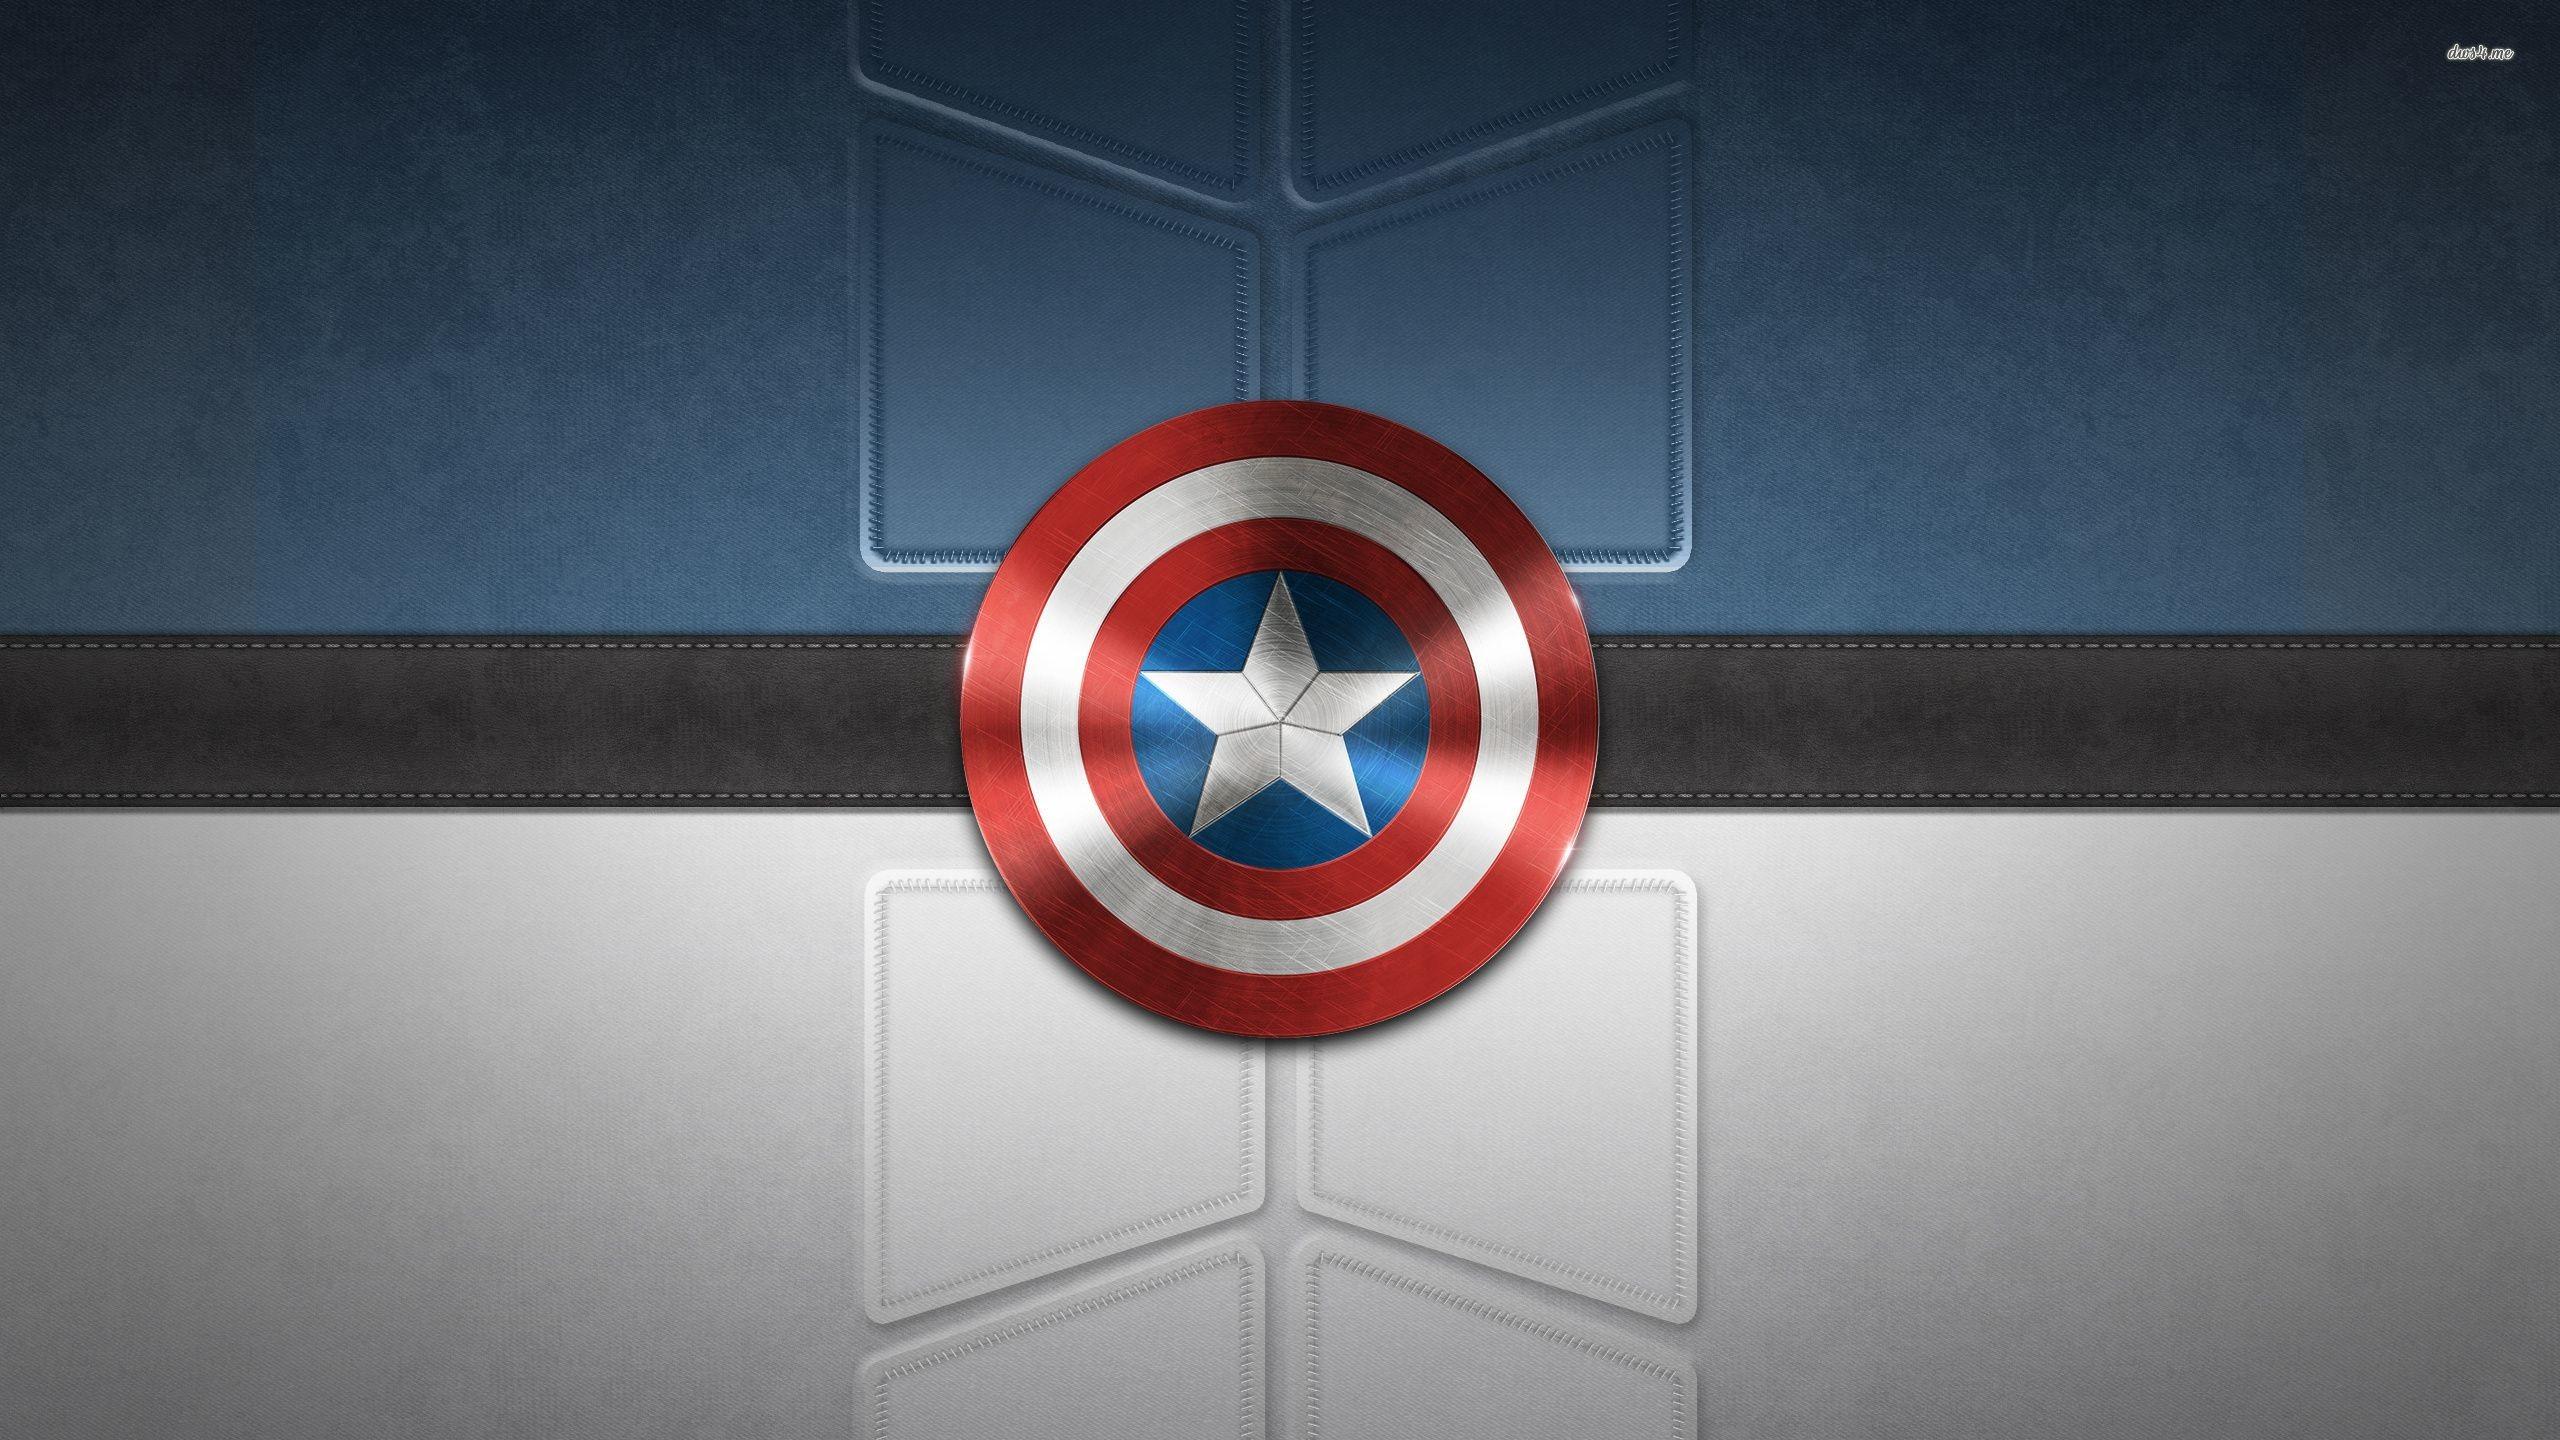 Captain America: The First Avenger shield wallpaper – Movie .